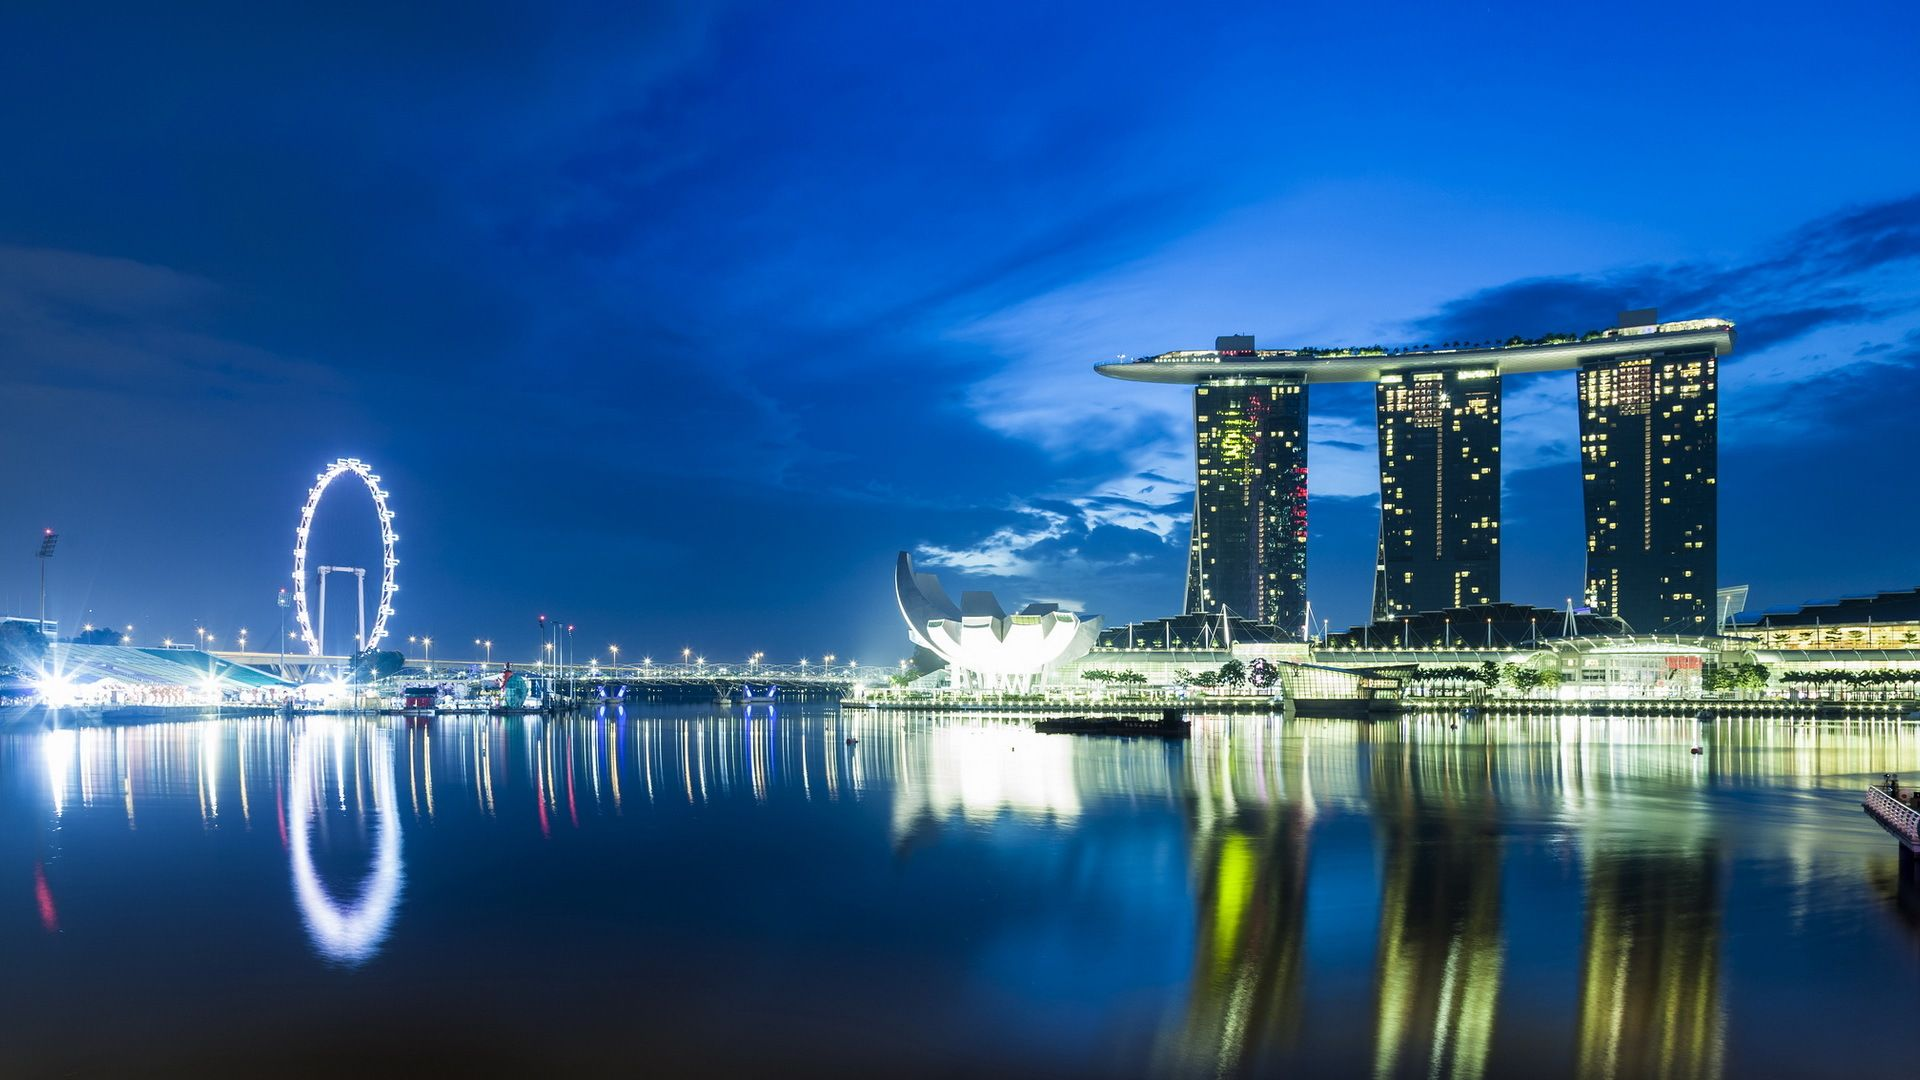 singaporehdwallpaperanddesktopbackgroundin1920x1080